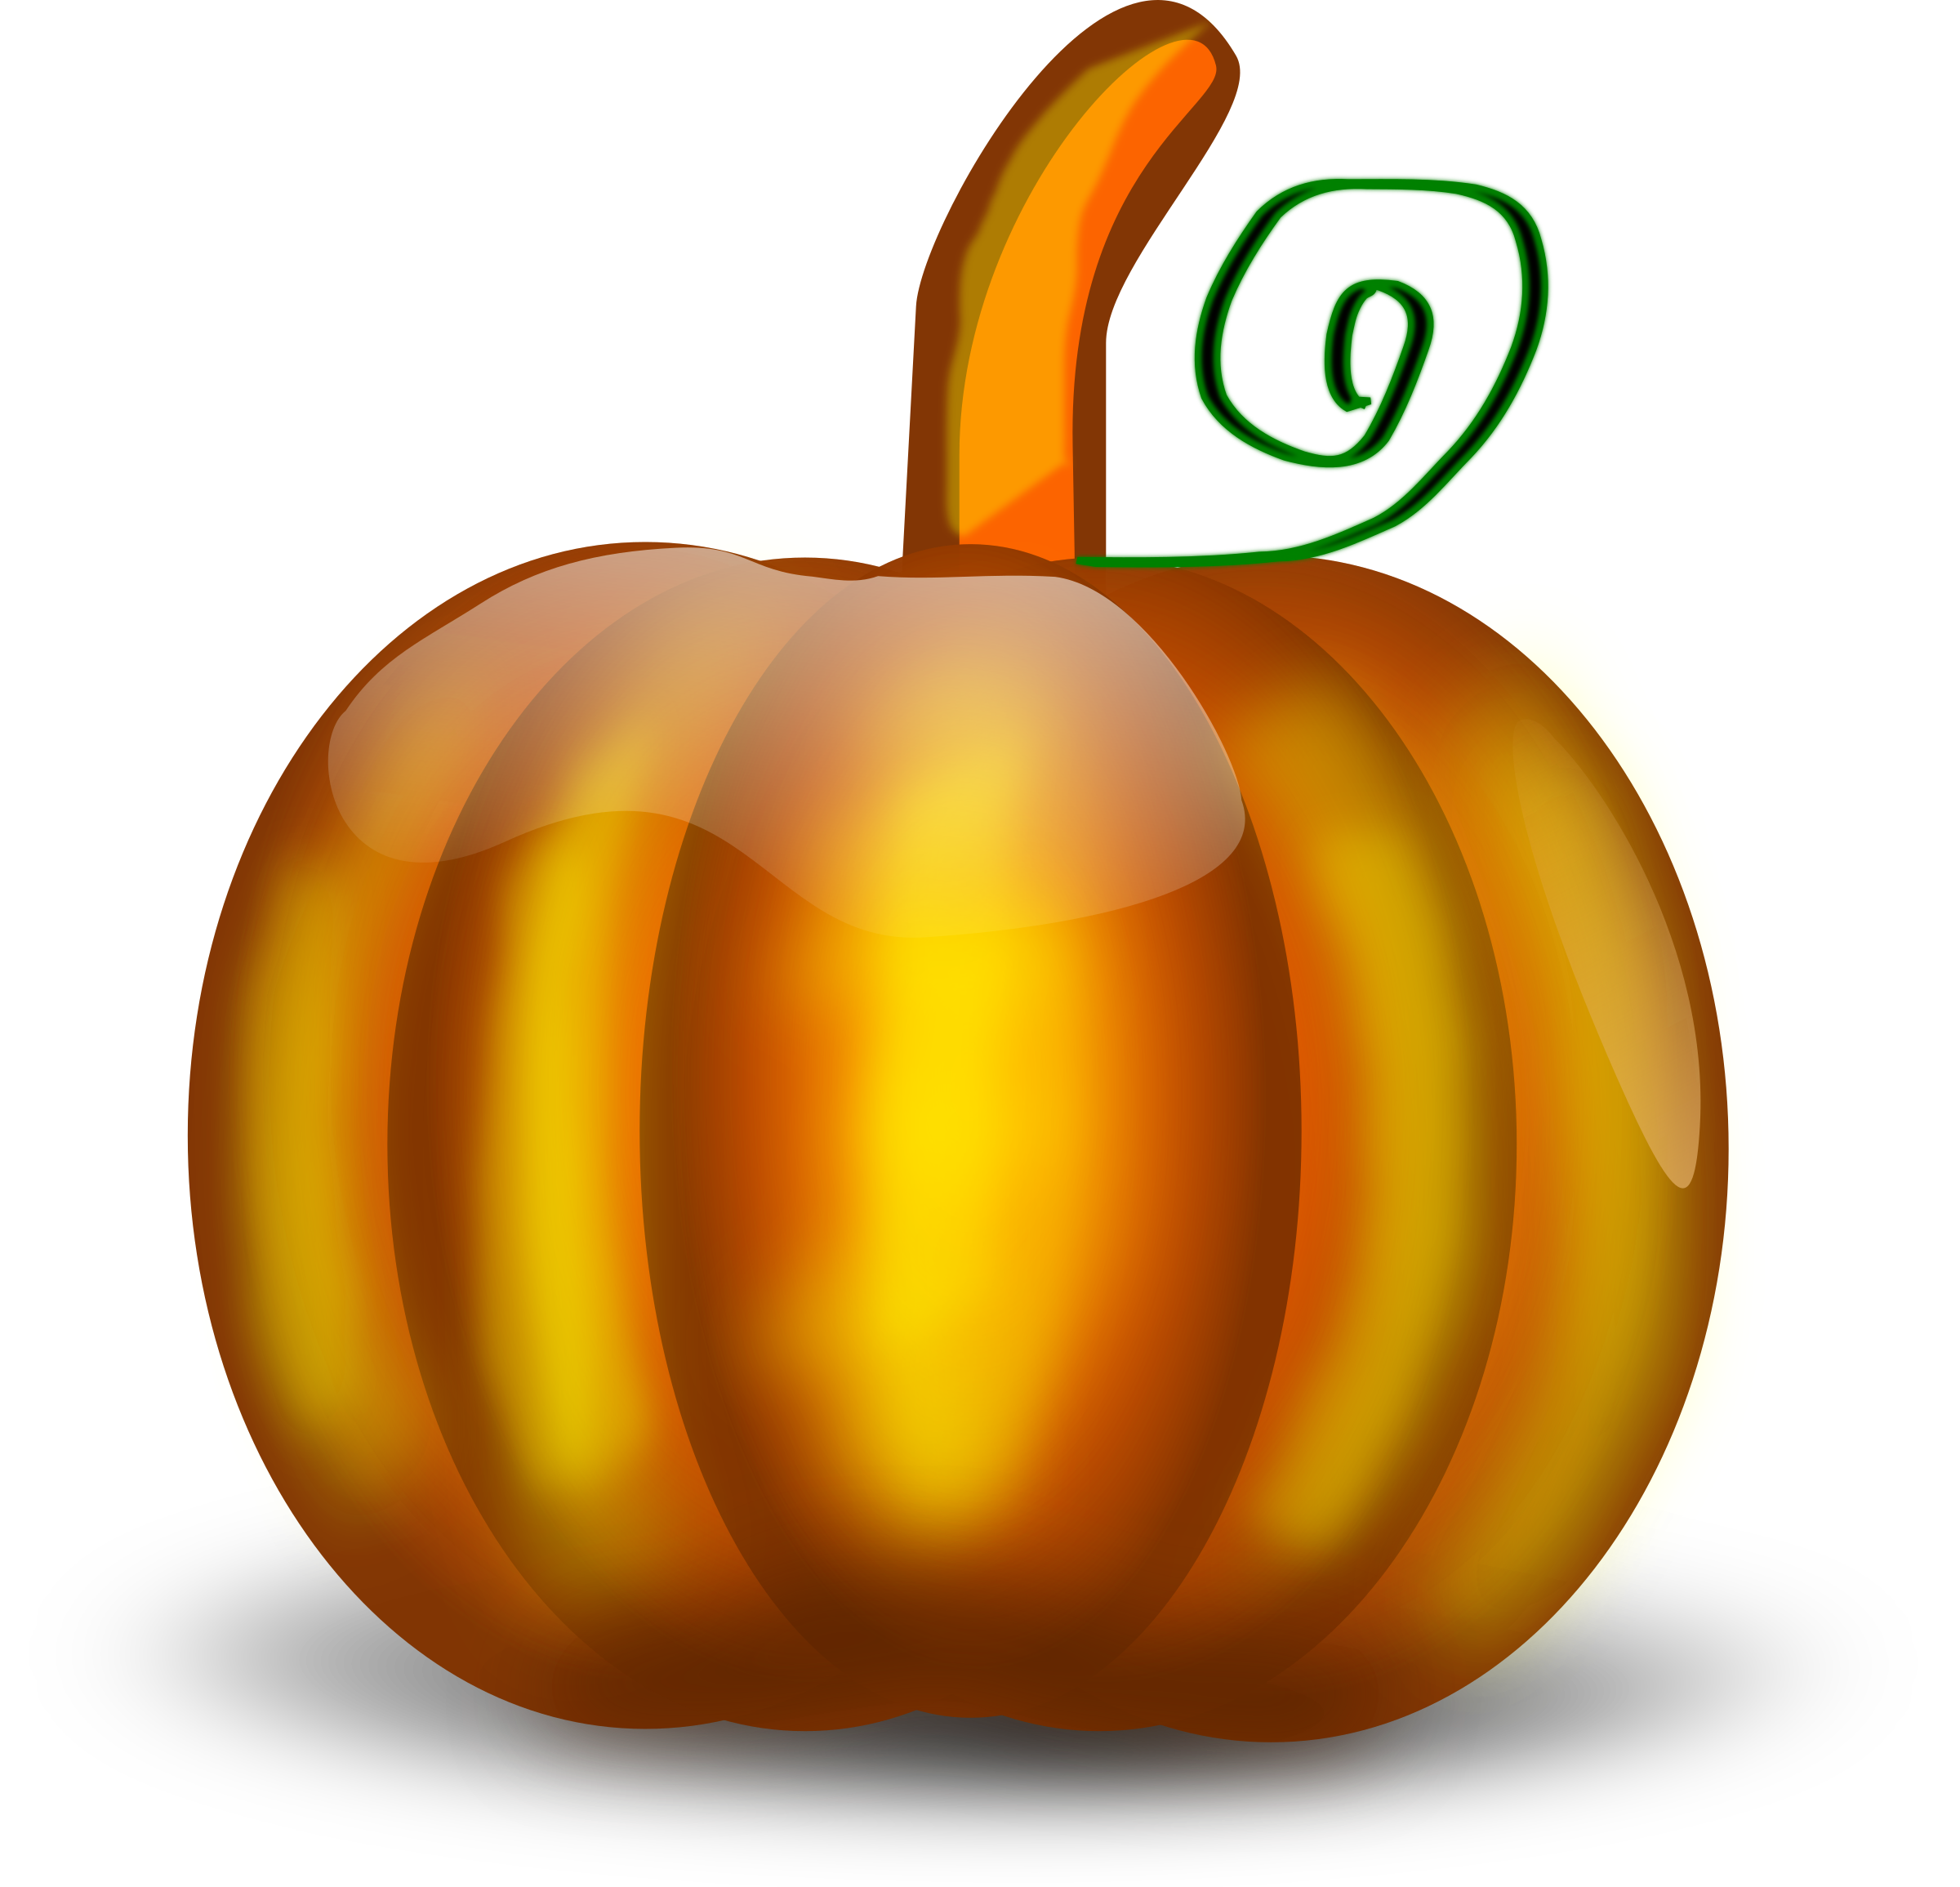 Clipart of a pumpkin jpg freeuse download Clipart - Pumpkin jpg freeuse download